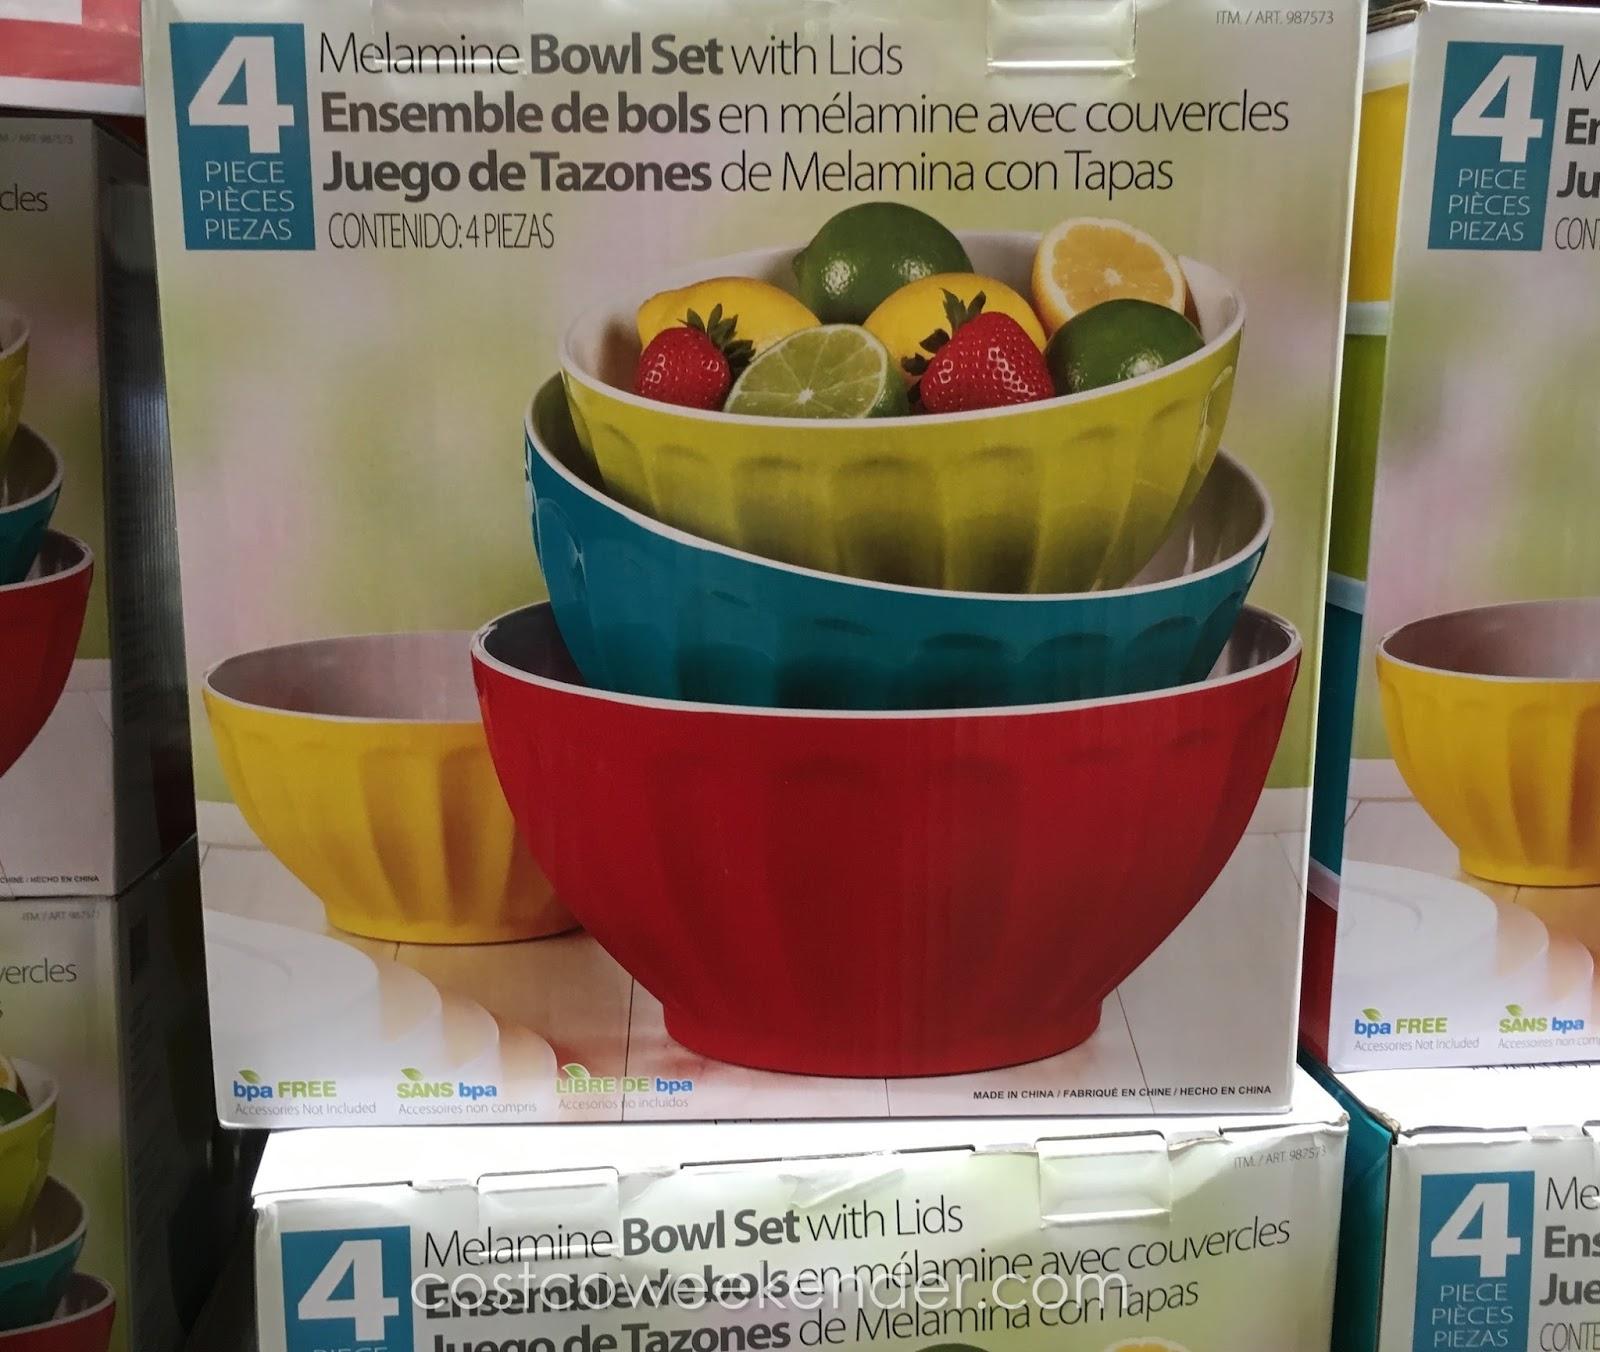 4-Piece Melamine Mixing Bowl Set | Costco Weekender